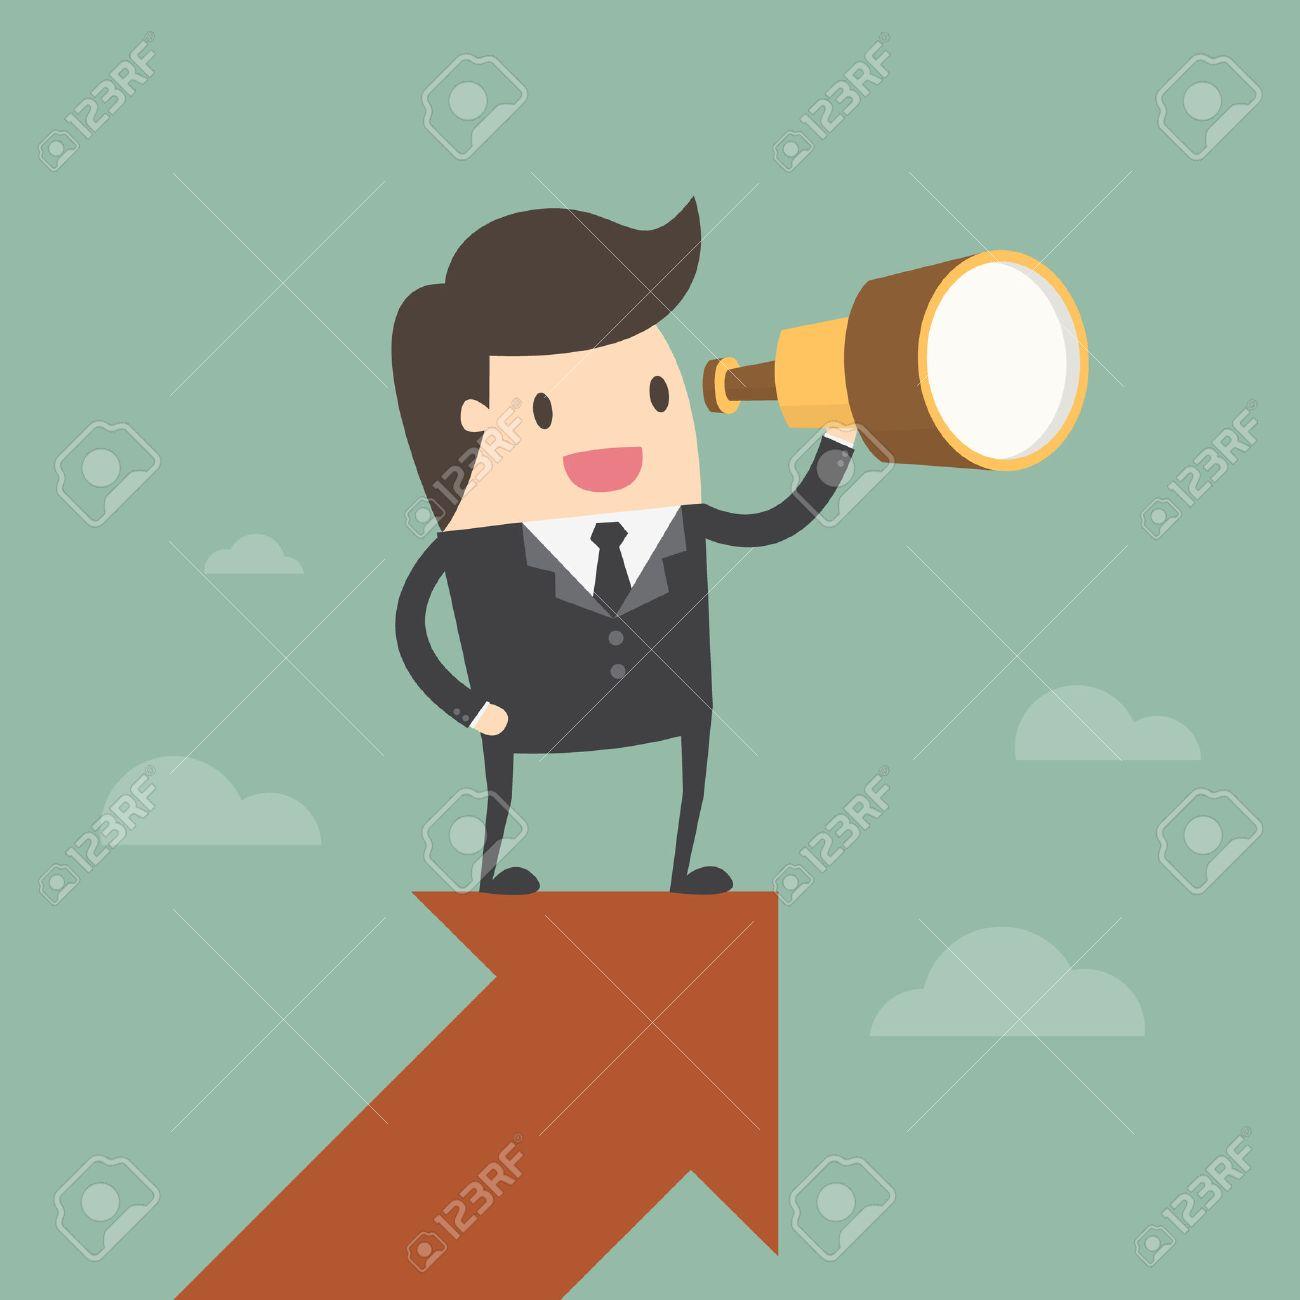 Vision and Growth concept. Businessman looks through a telescope on growth arrow. Business concept cartoon illustration - 55516358